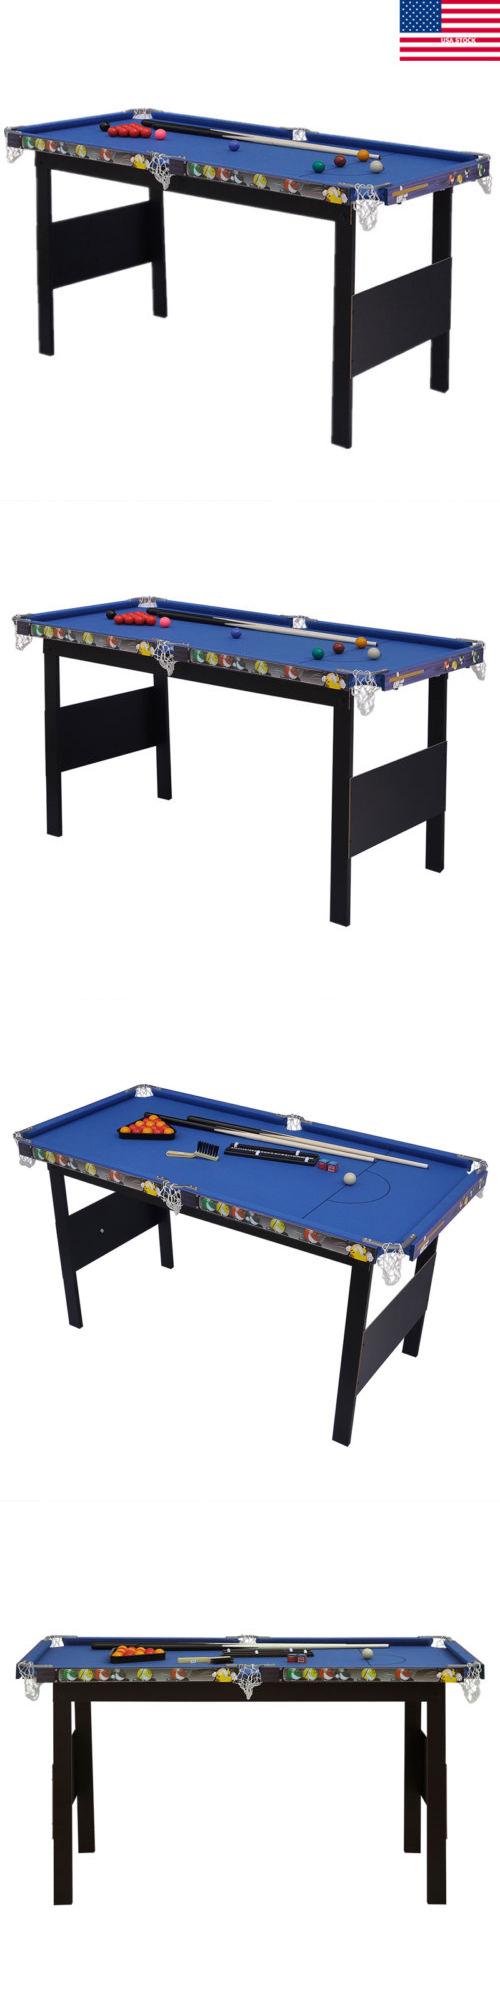 Tables 21213: 48 Portable Billiard Pool Table Top Indoor Game Balls Cues  Board Billiards Set